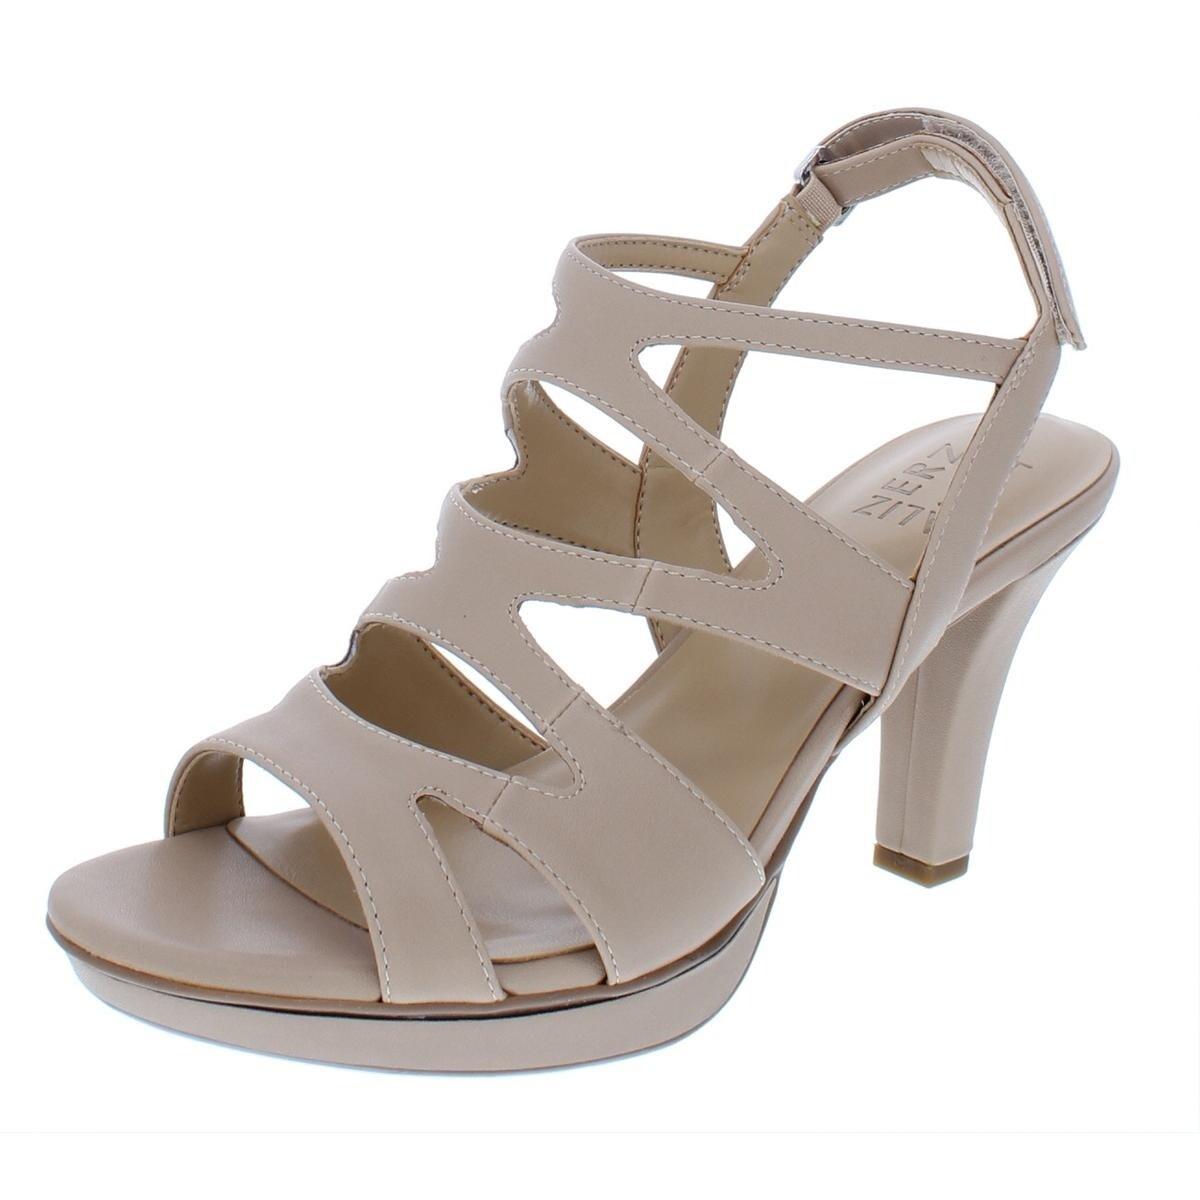 11904868789e35 Shop Naturalizer Womens Dianna Slingback Sandals Faux Leather Caged ...